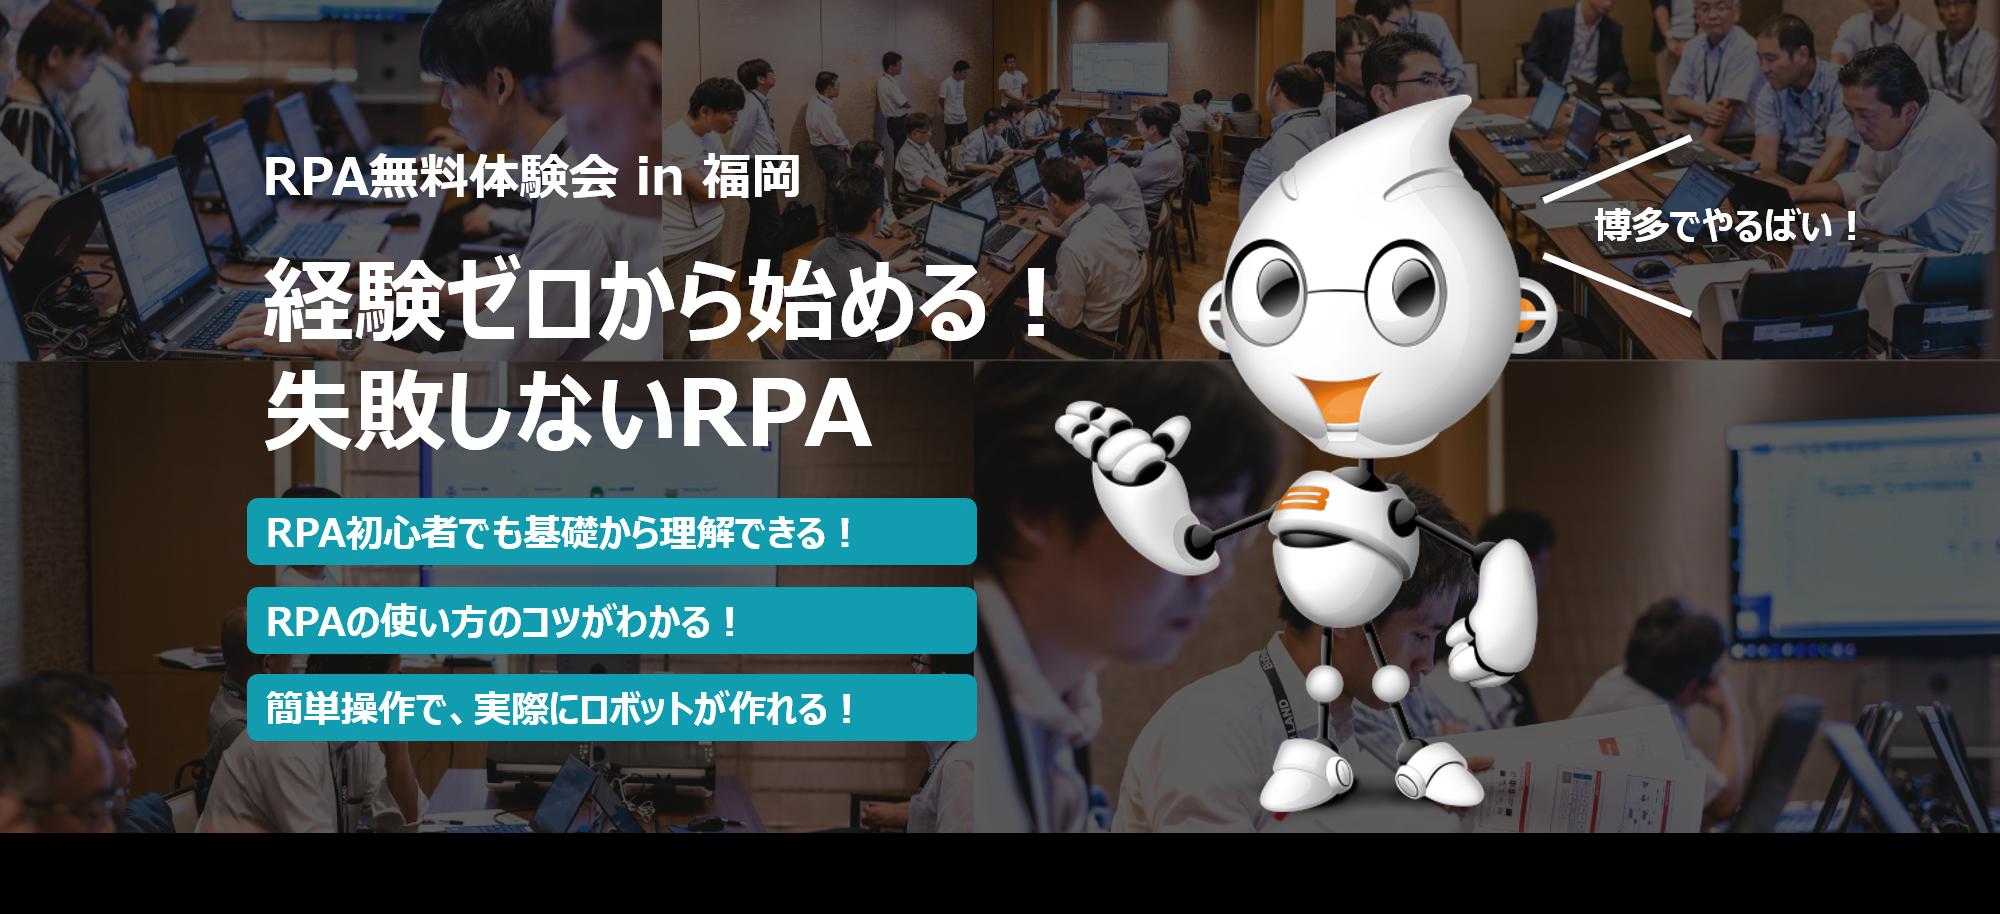 RPA無料体験会in福岡